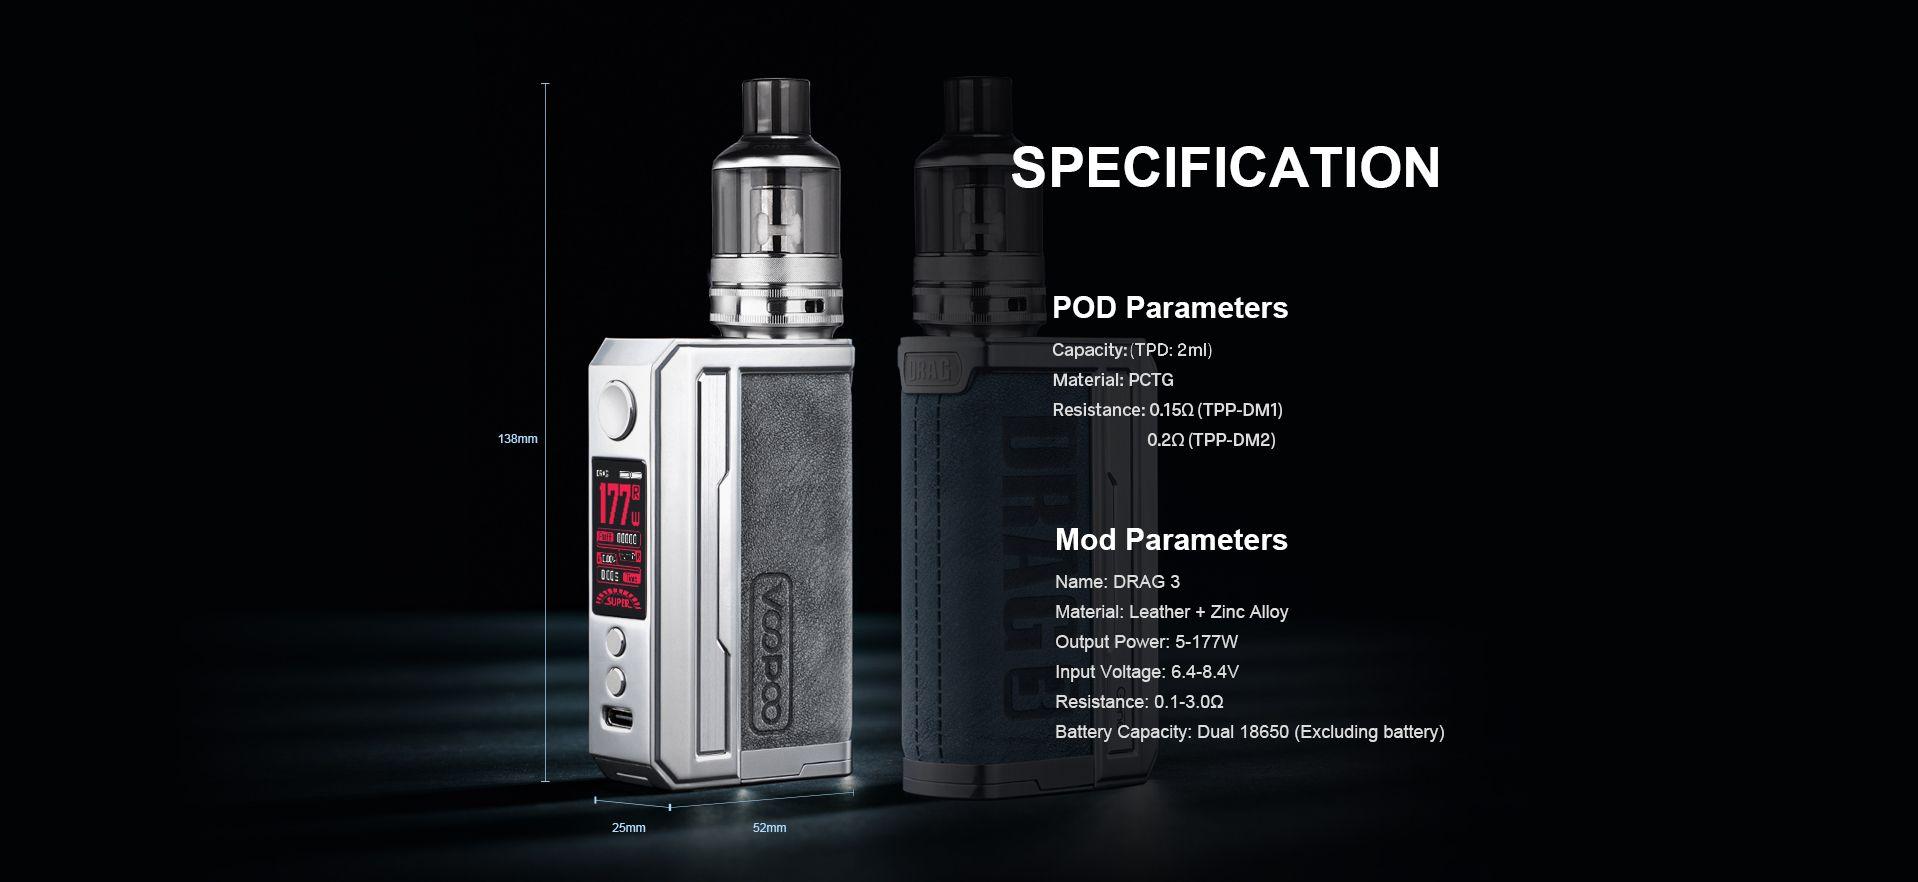 Voopoo Drag 3 specs specifications